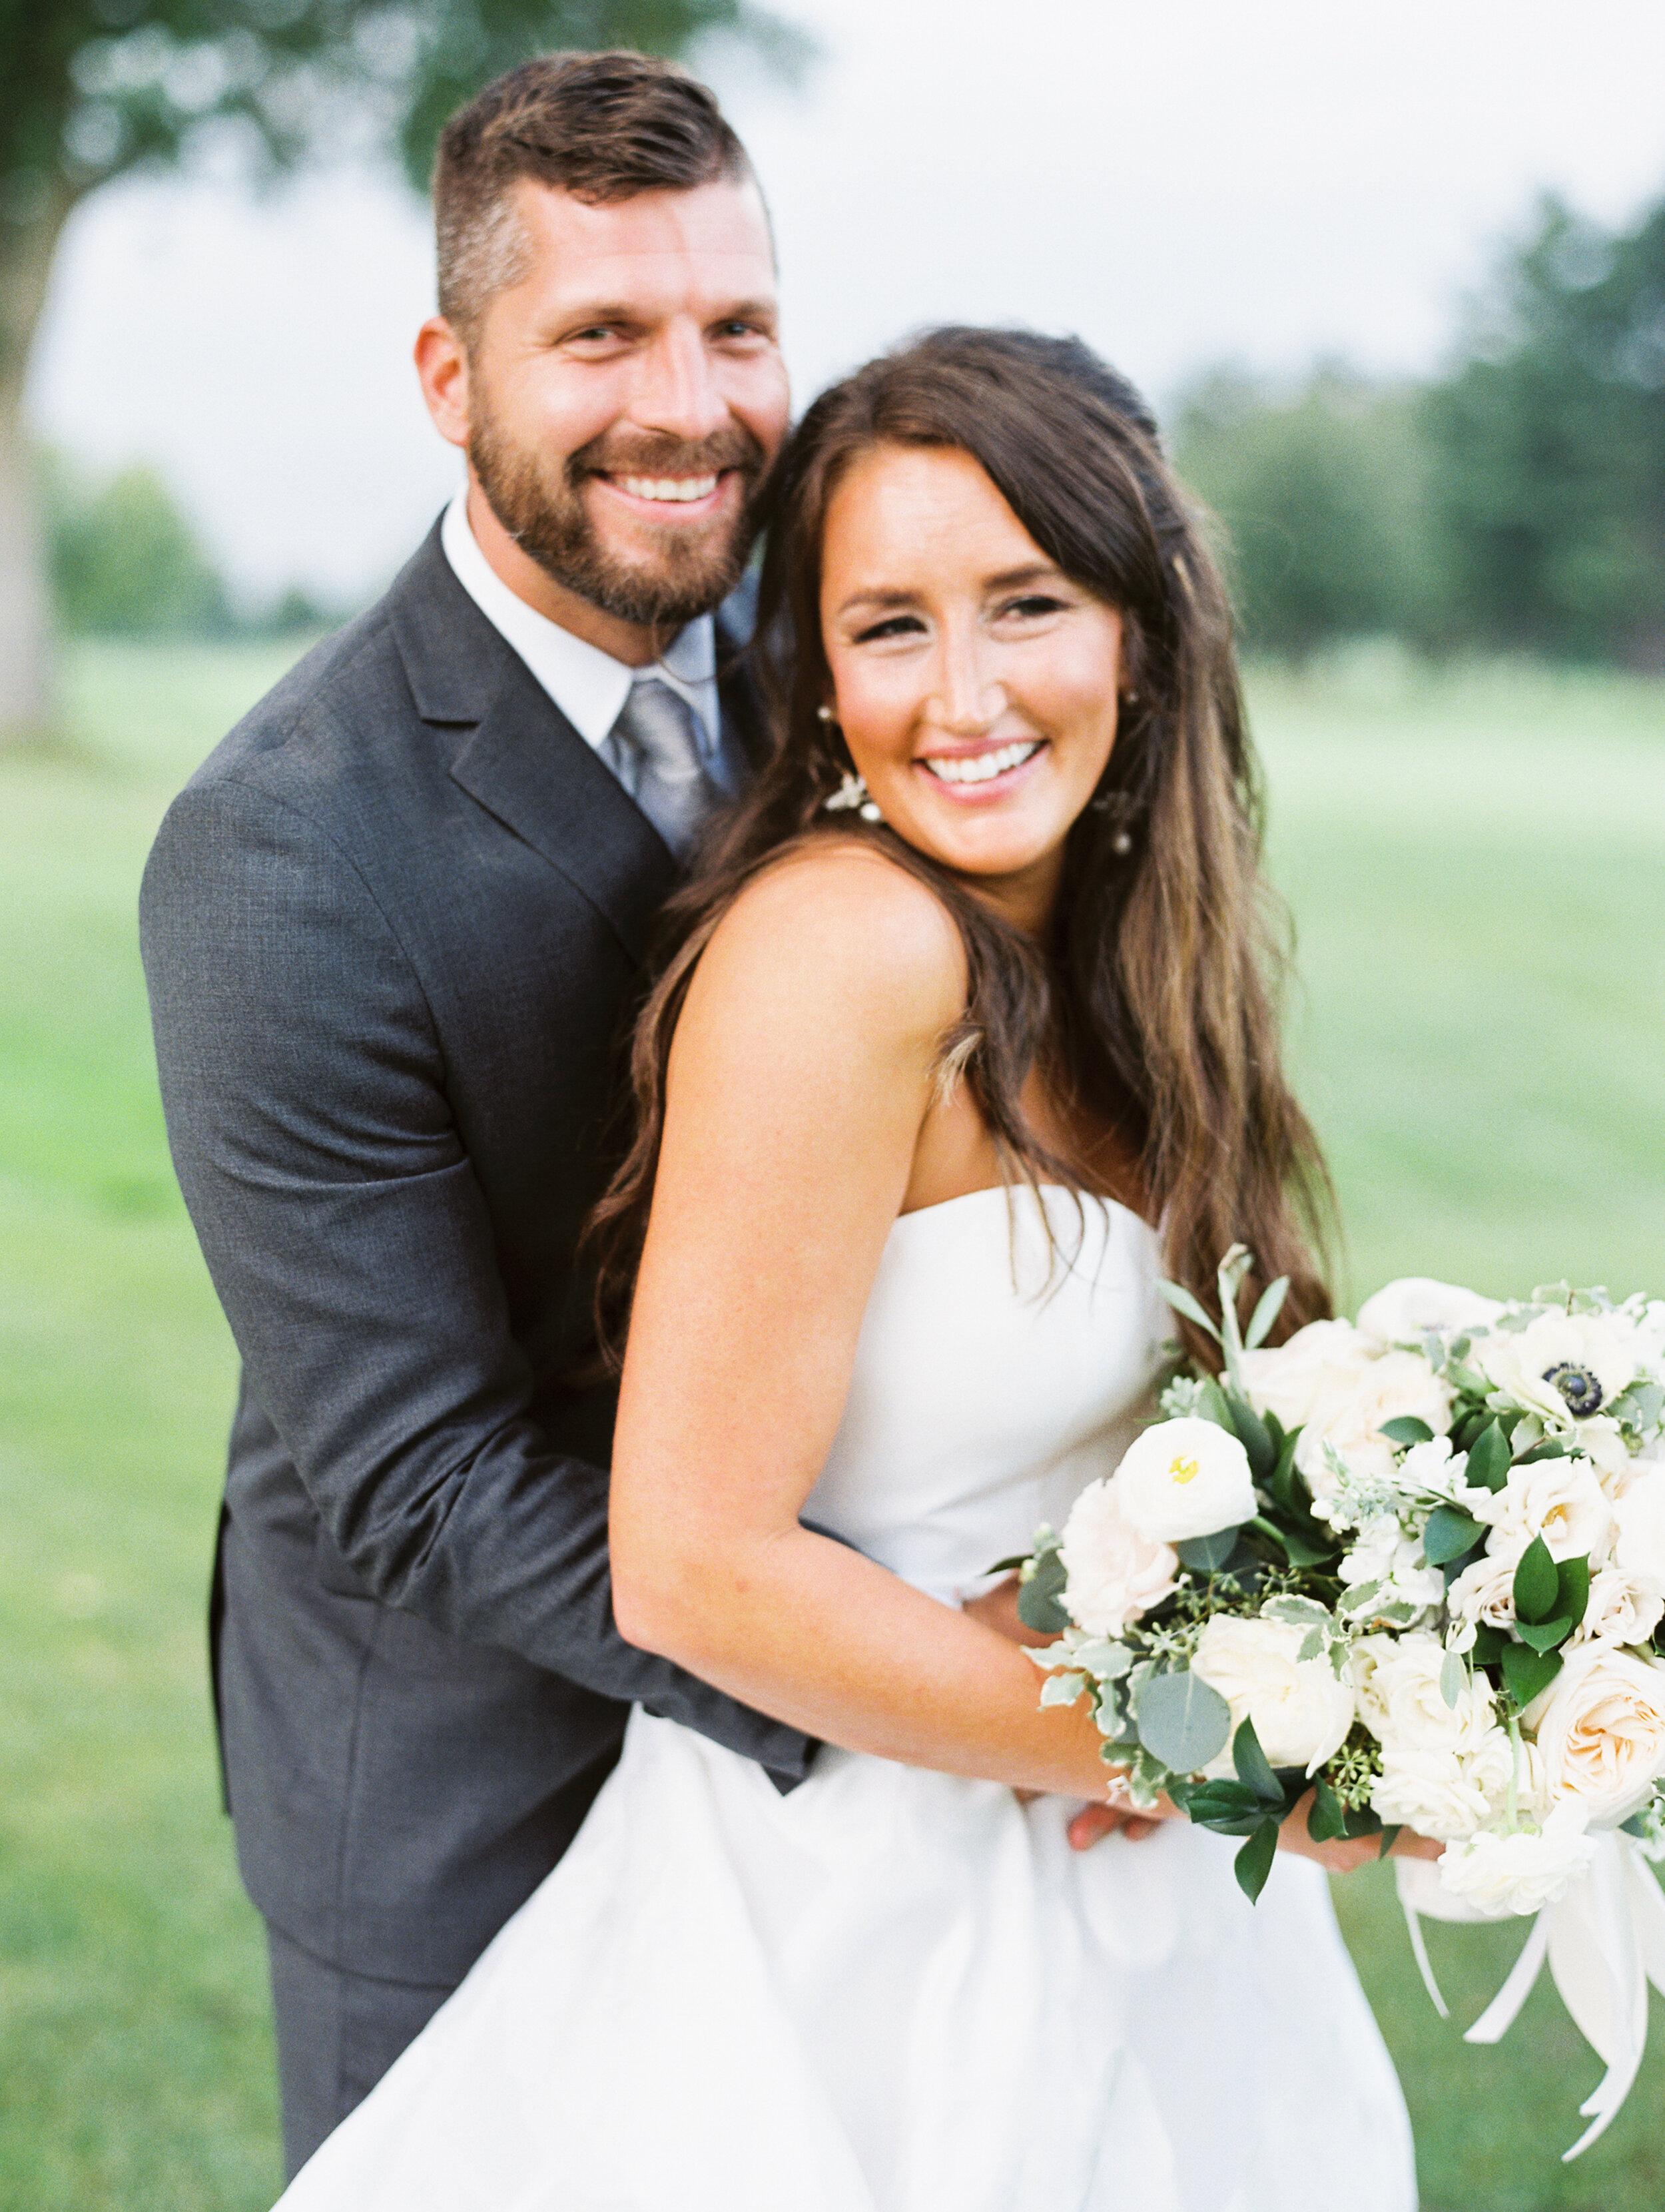 Kuiper+Wedding+Reception+Bridal+Party-143.jpg